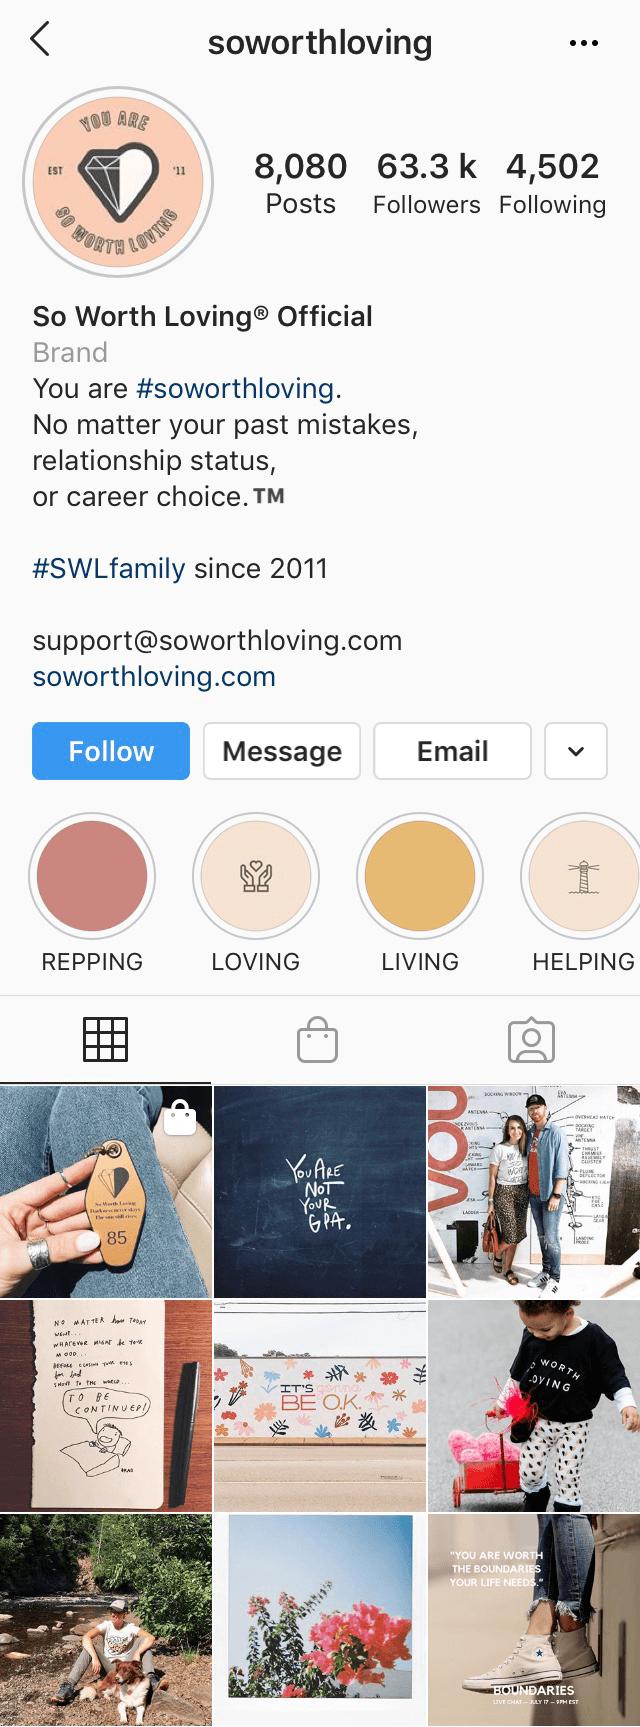 Instagram profile of @soworthloving